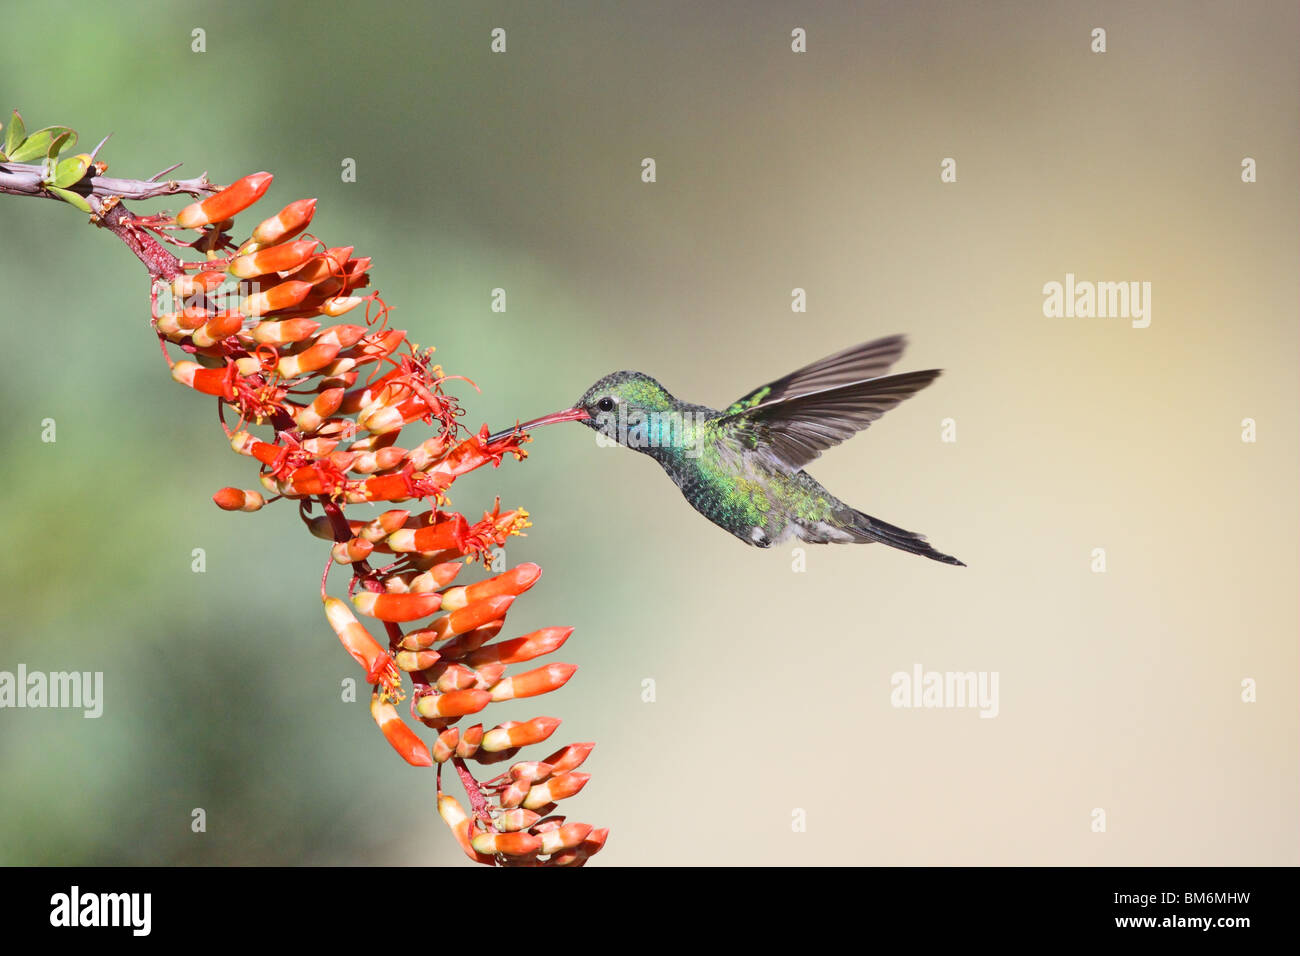 Broad-billed Hummingbird Adult Male at Ocotillo flowers. - Stock Image